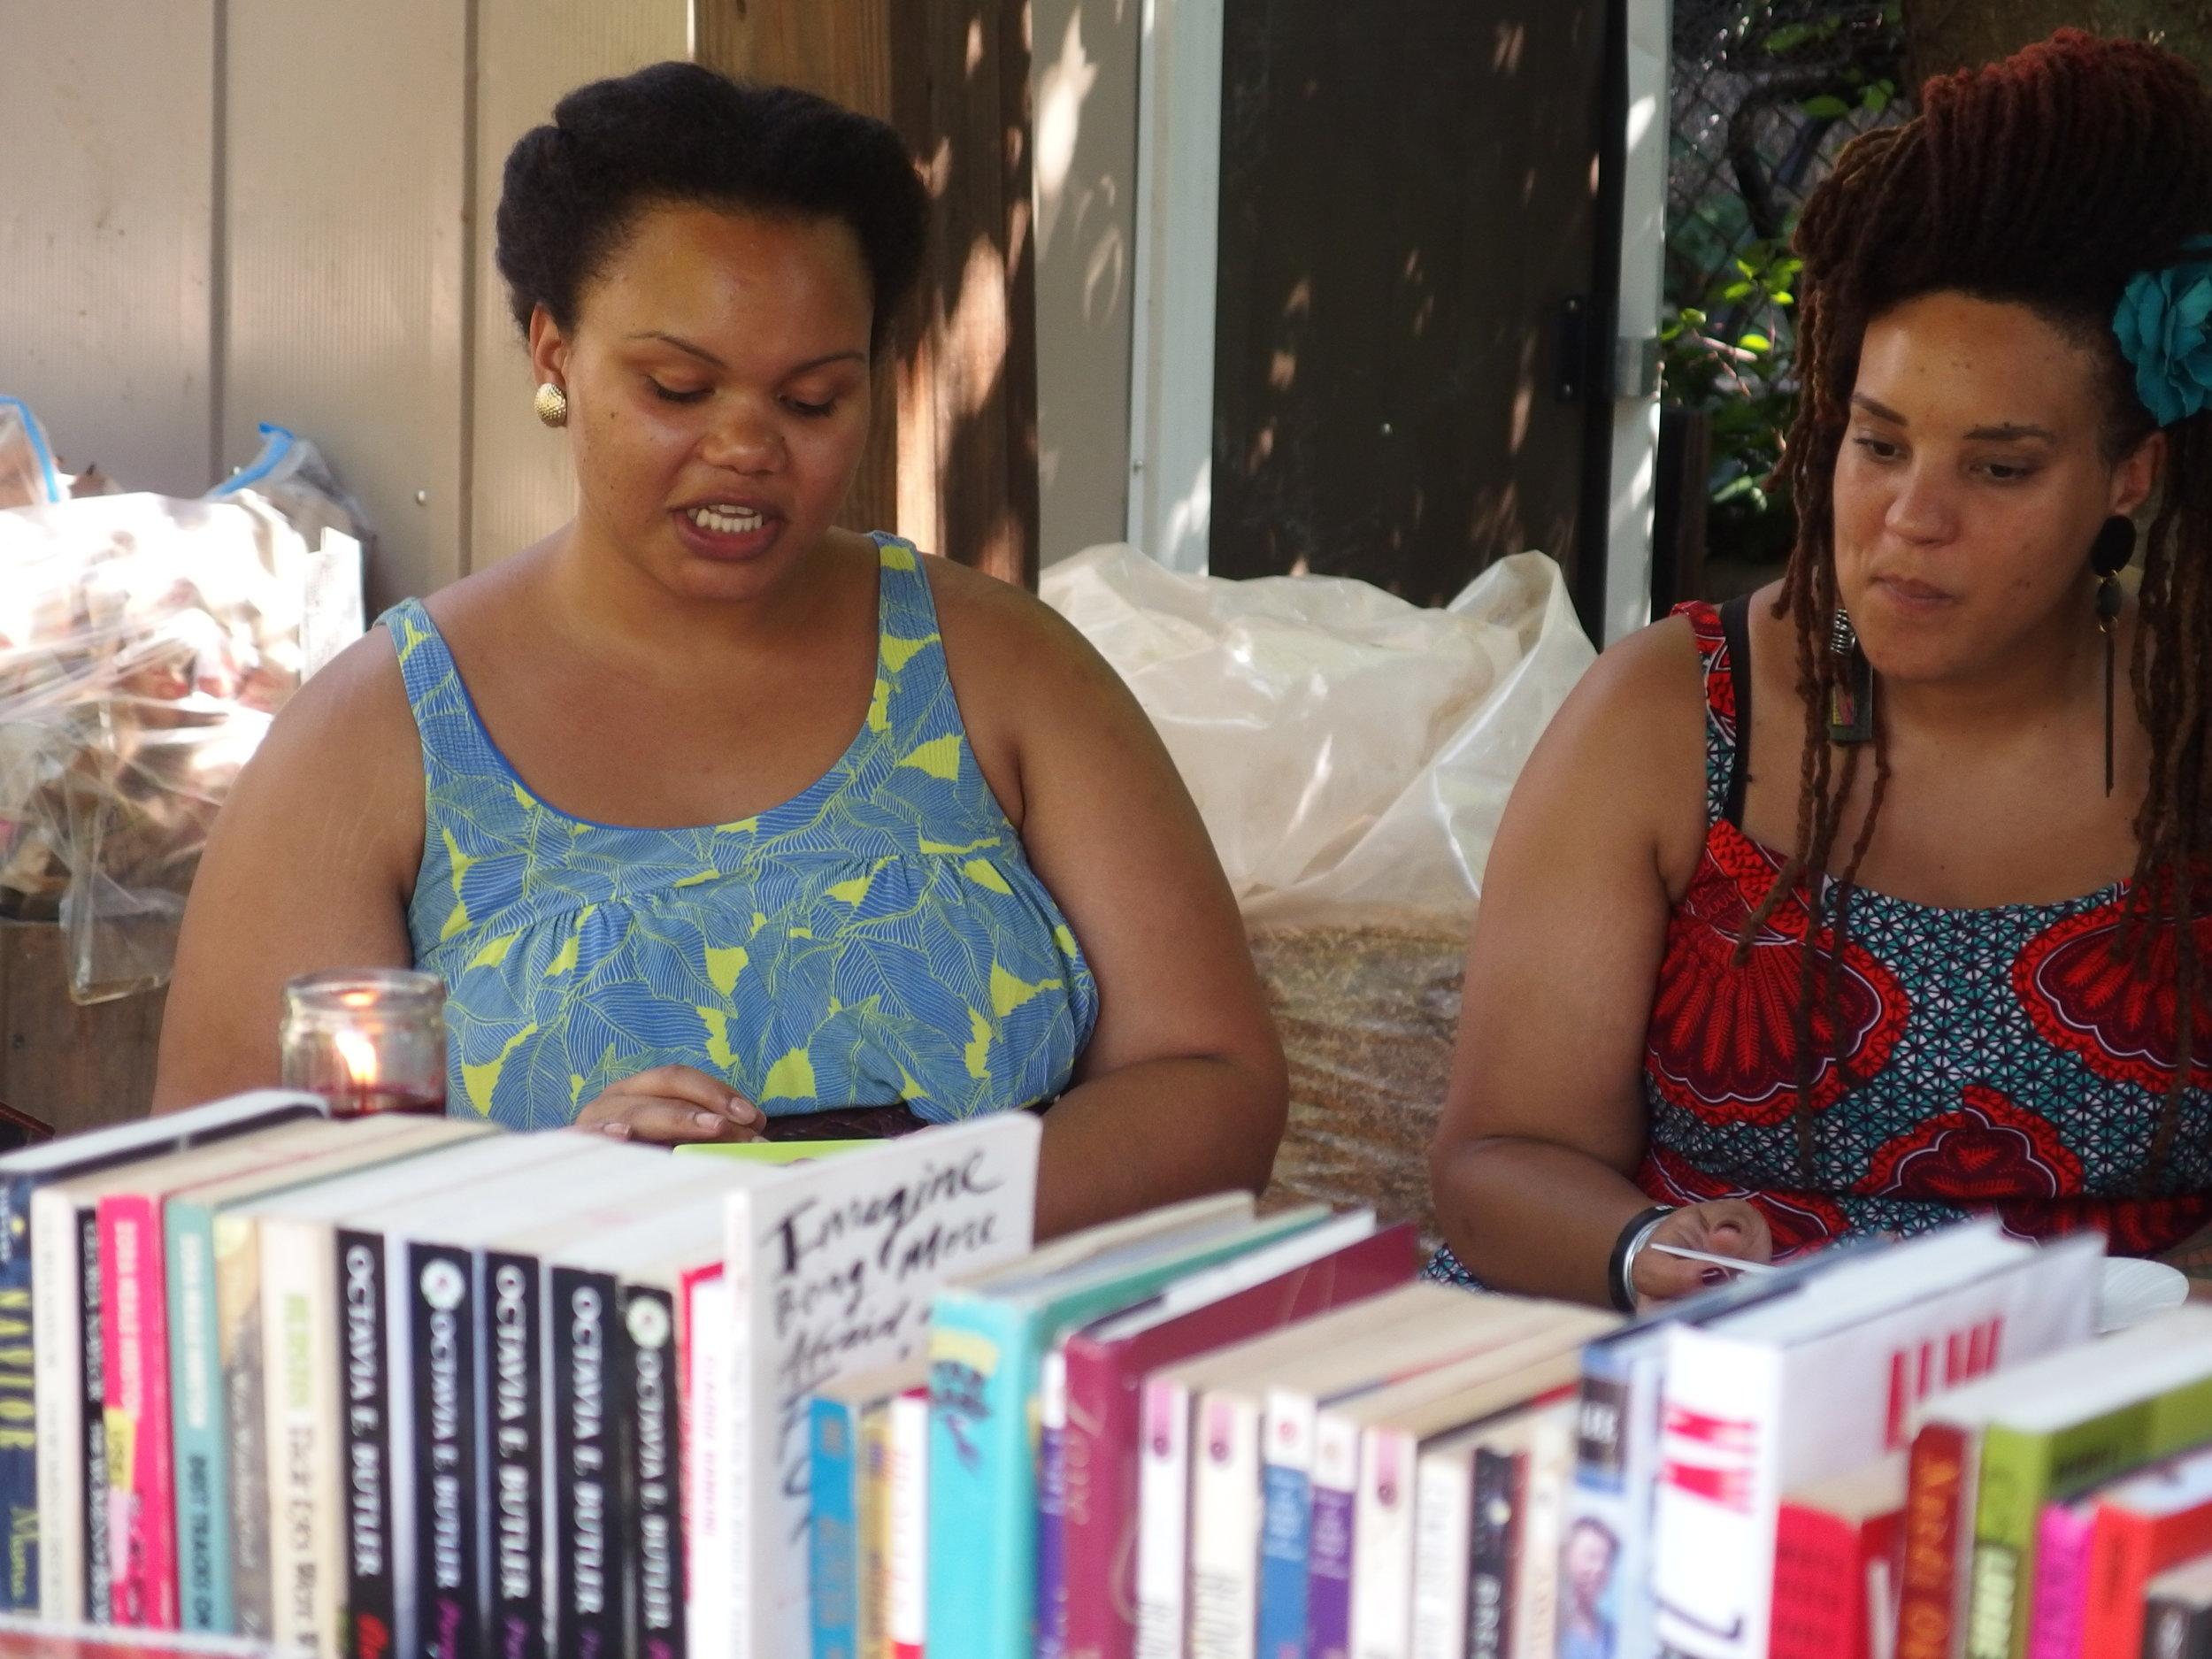 little-free-black-womens-library_20951110075_o.jpg